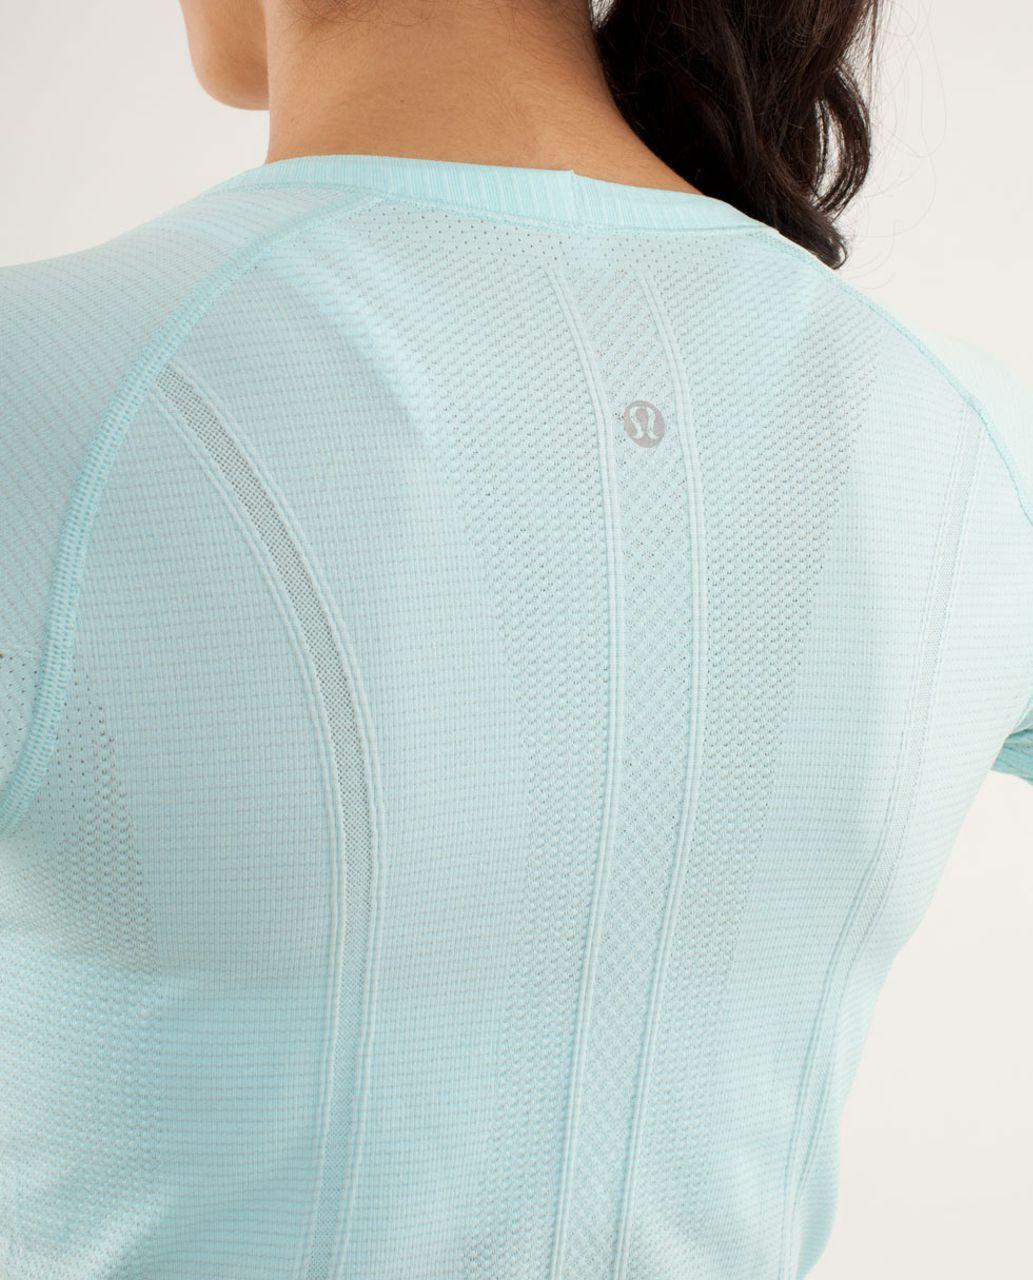 Lululemon Run:  Swiftly Tech Long Sleeve Scoop - Aquamarine